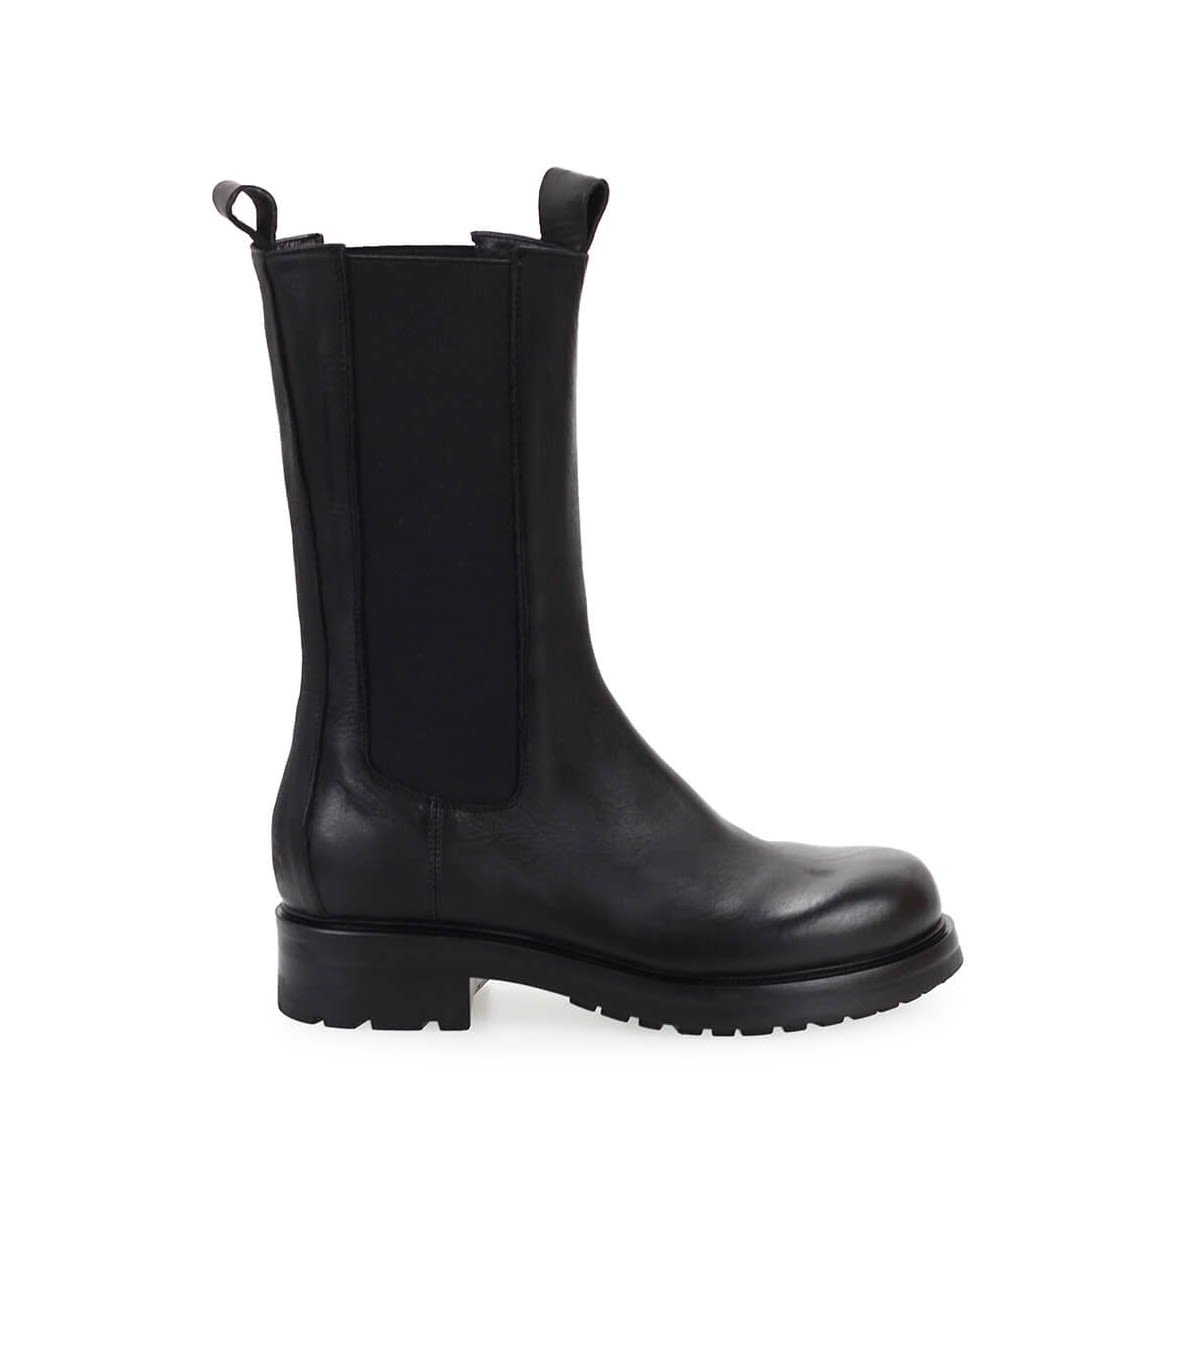 Elena Iachi Black Leather High Chelsea Boot